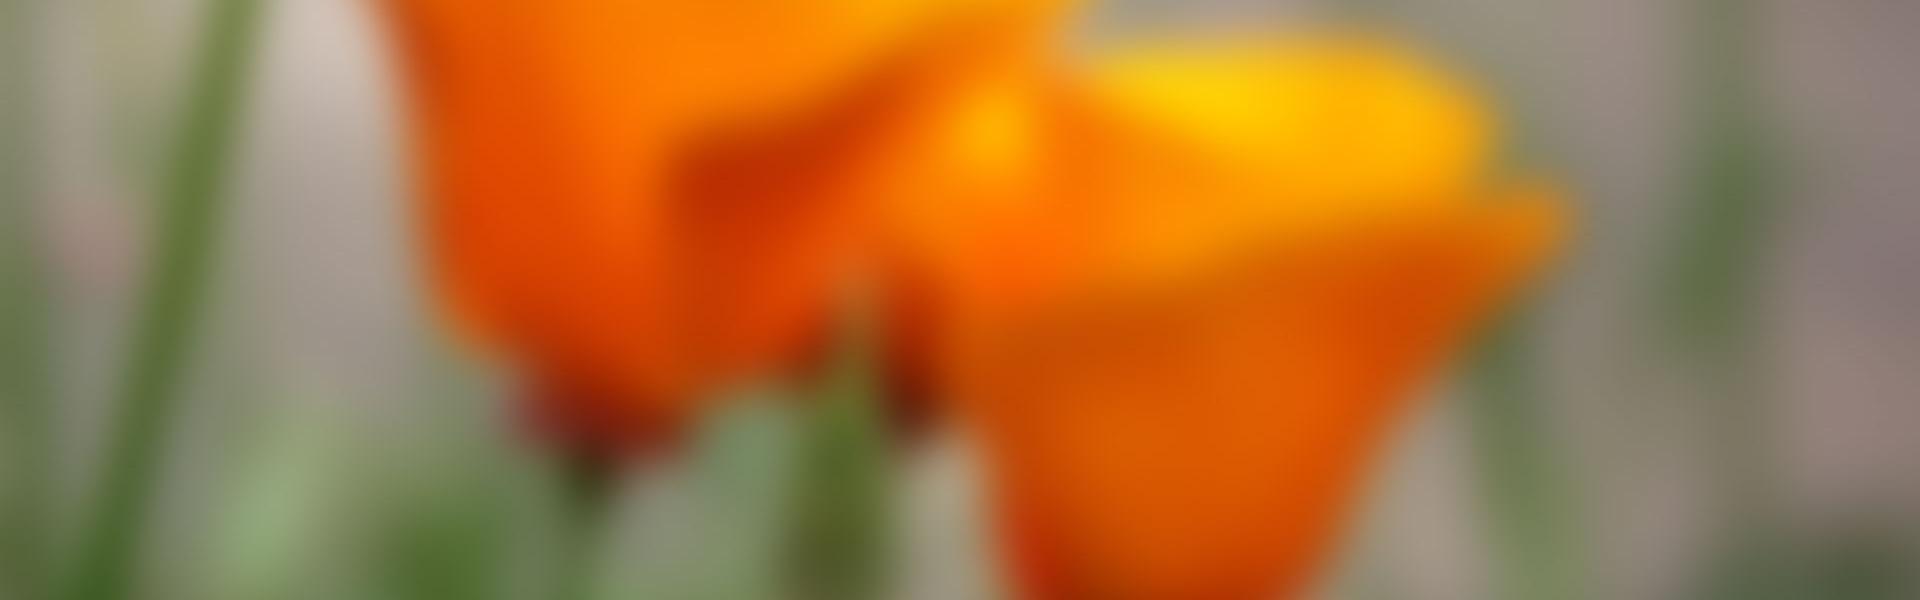 Wazige bloemen foto Praktijk Shufu